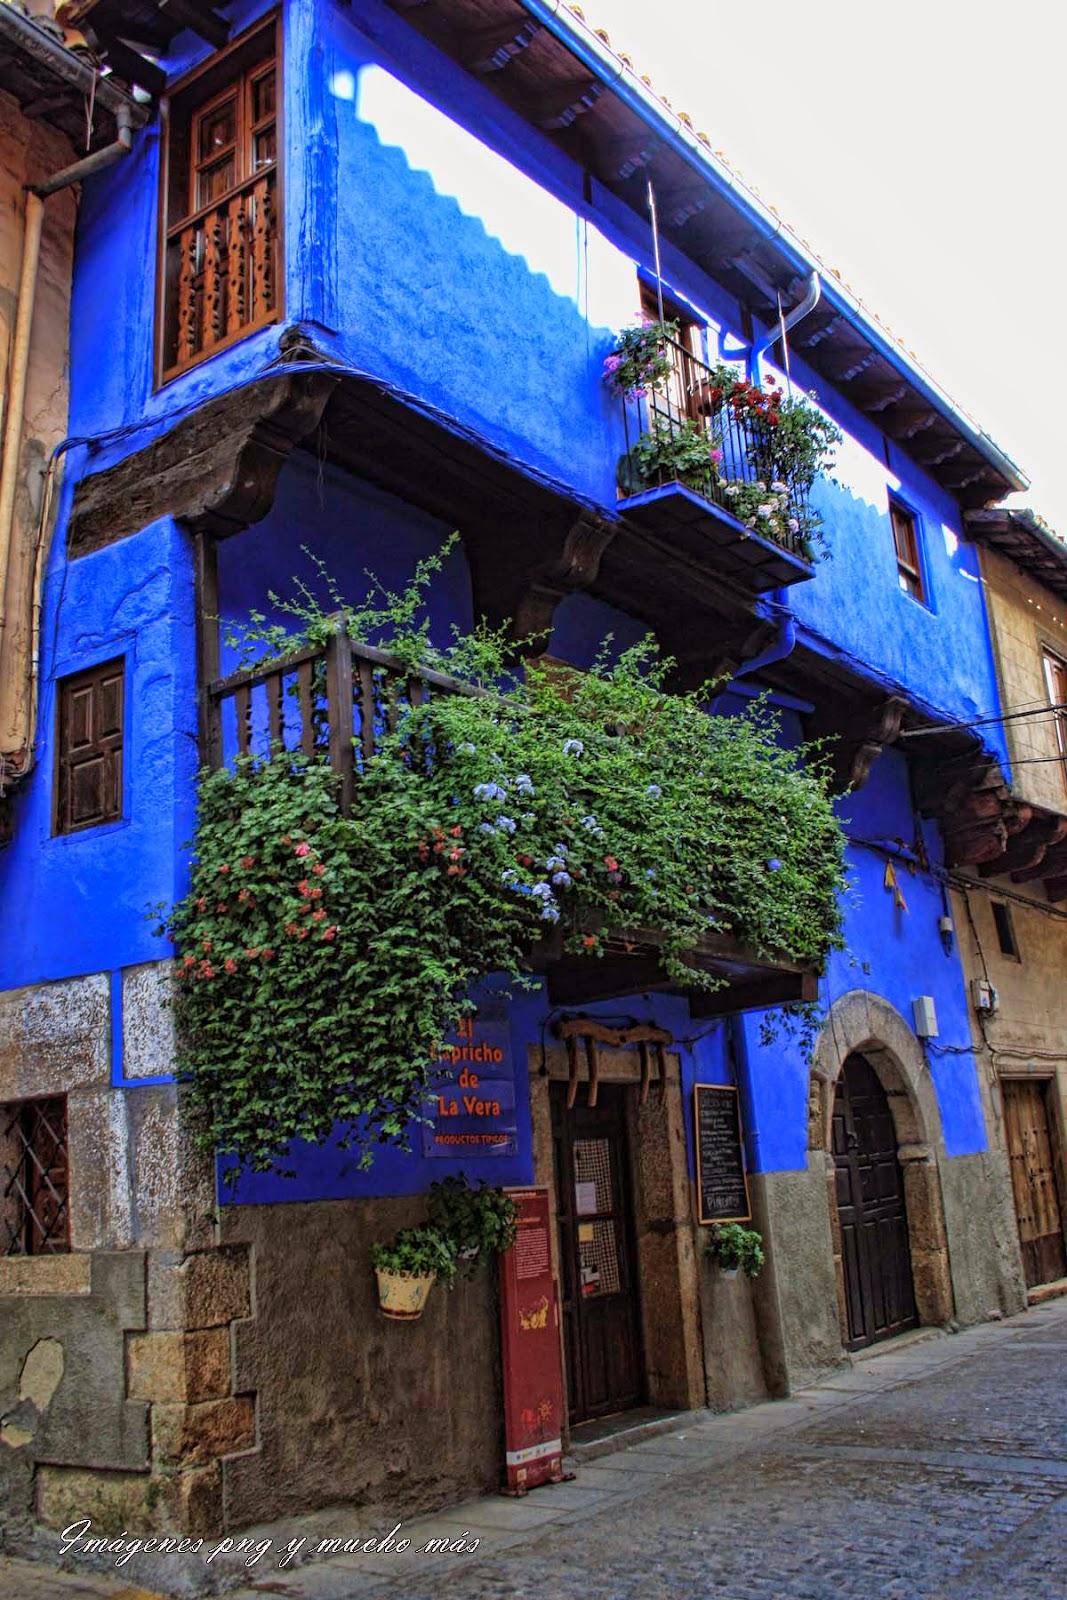 Im genes png y mucho m s el color azul a il la delataba - Casas de color azul ...